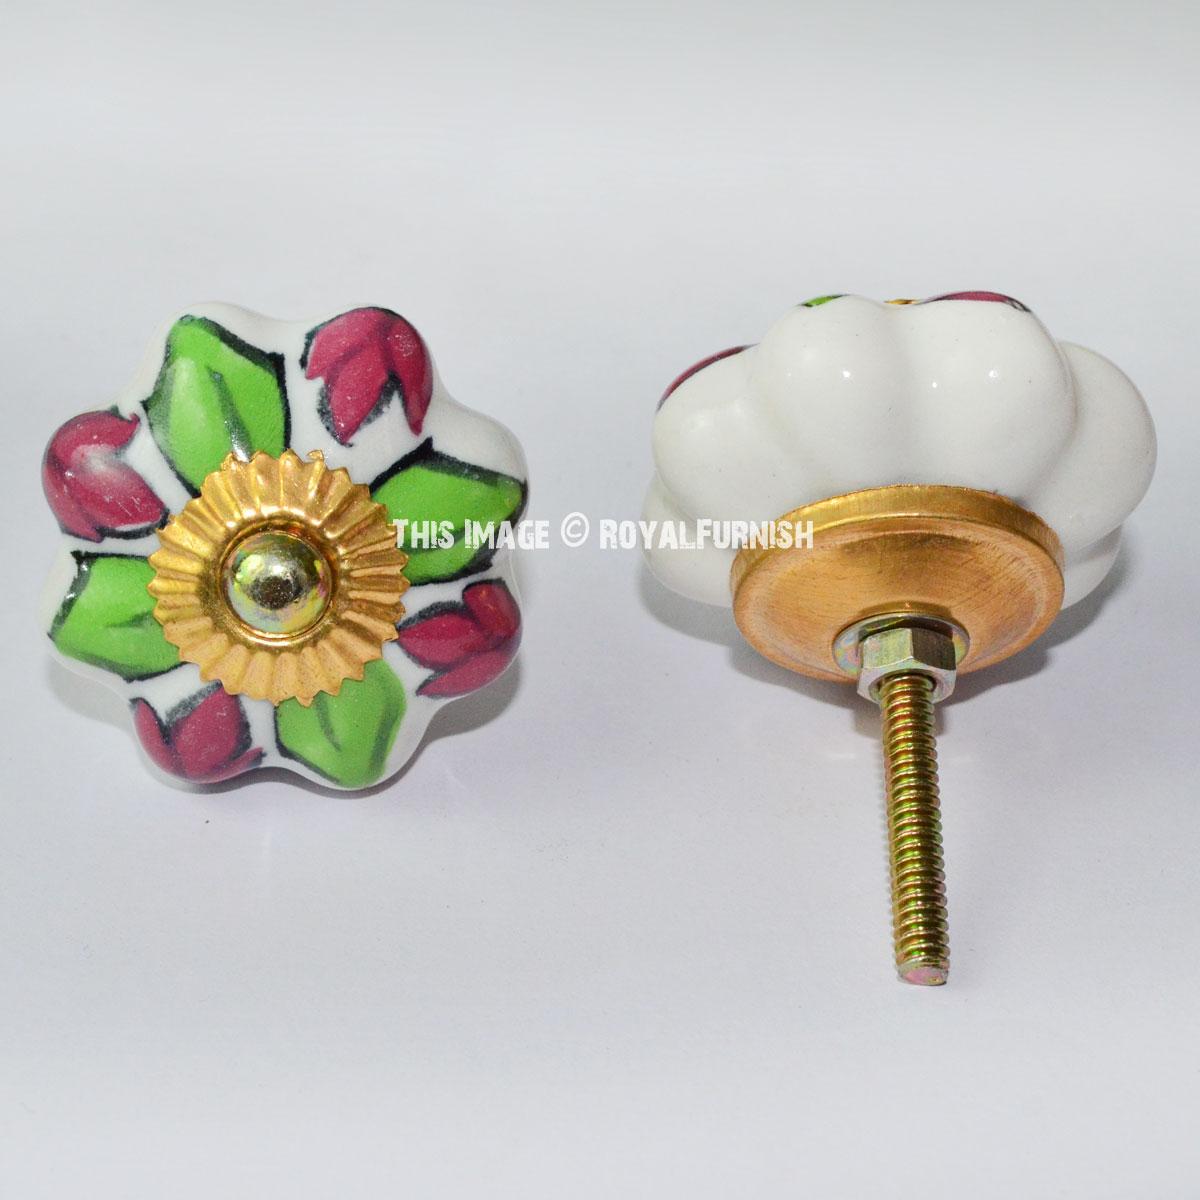 Decorative Knobs And Pulls Ceramic Knobs Royal Furnish